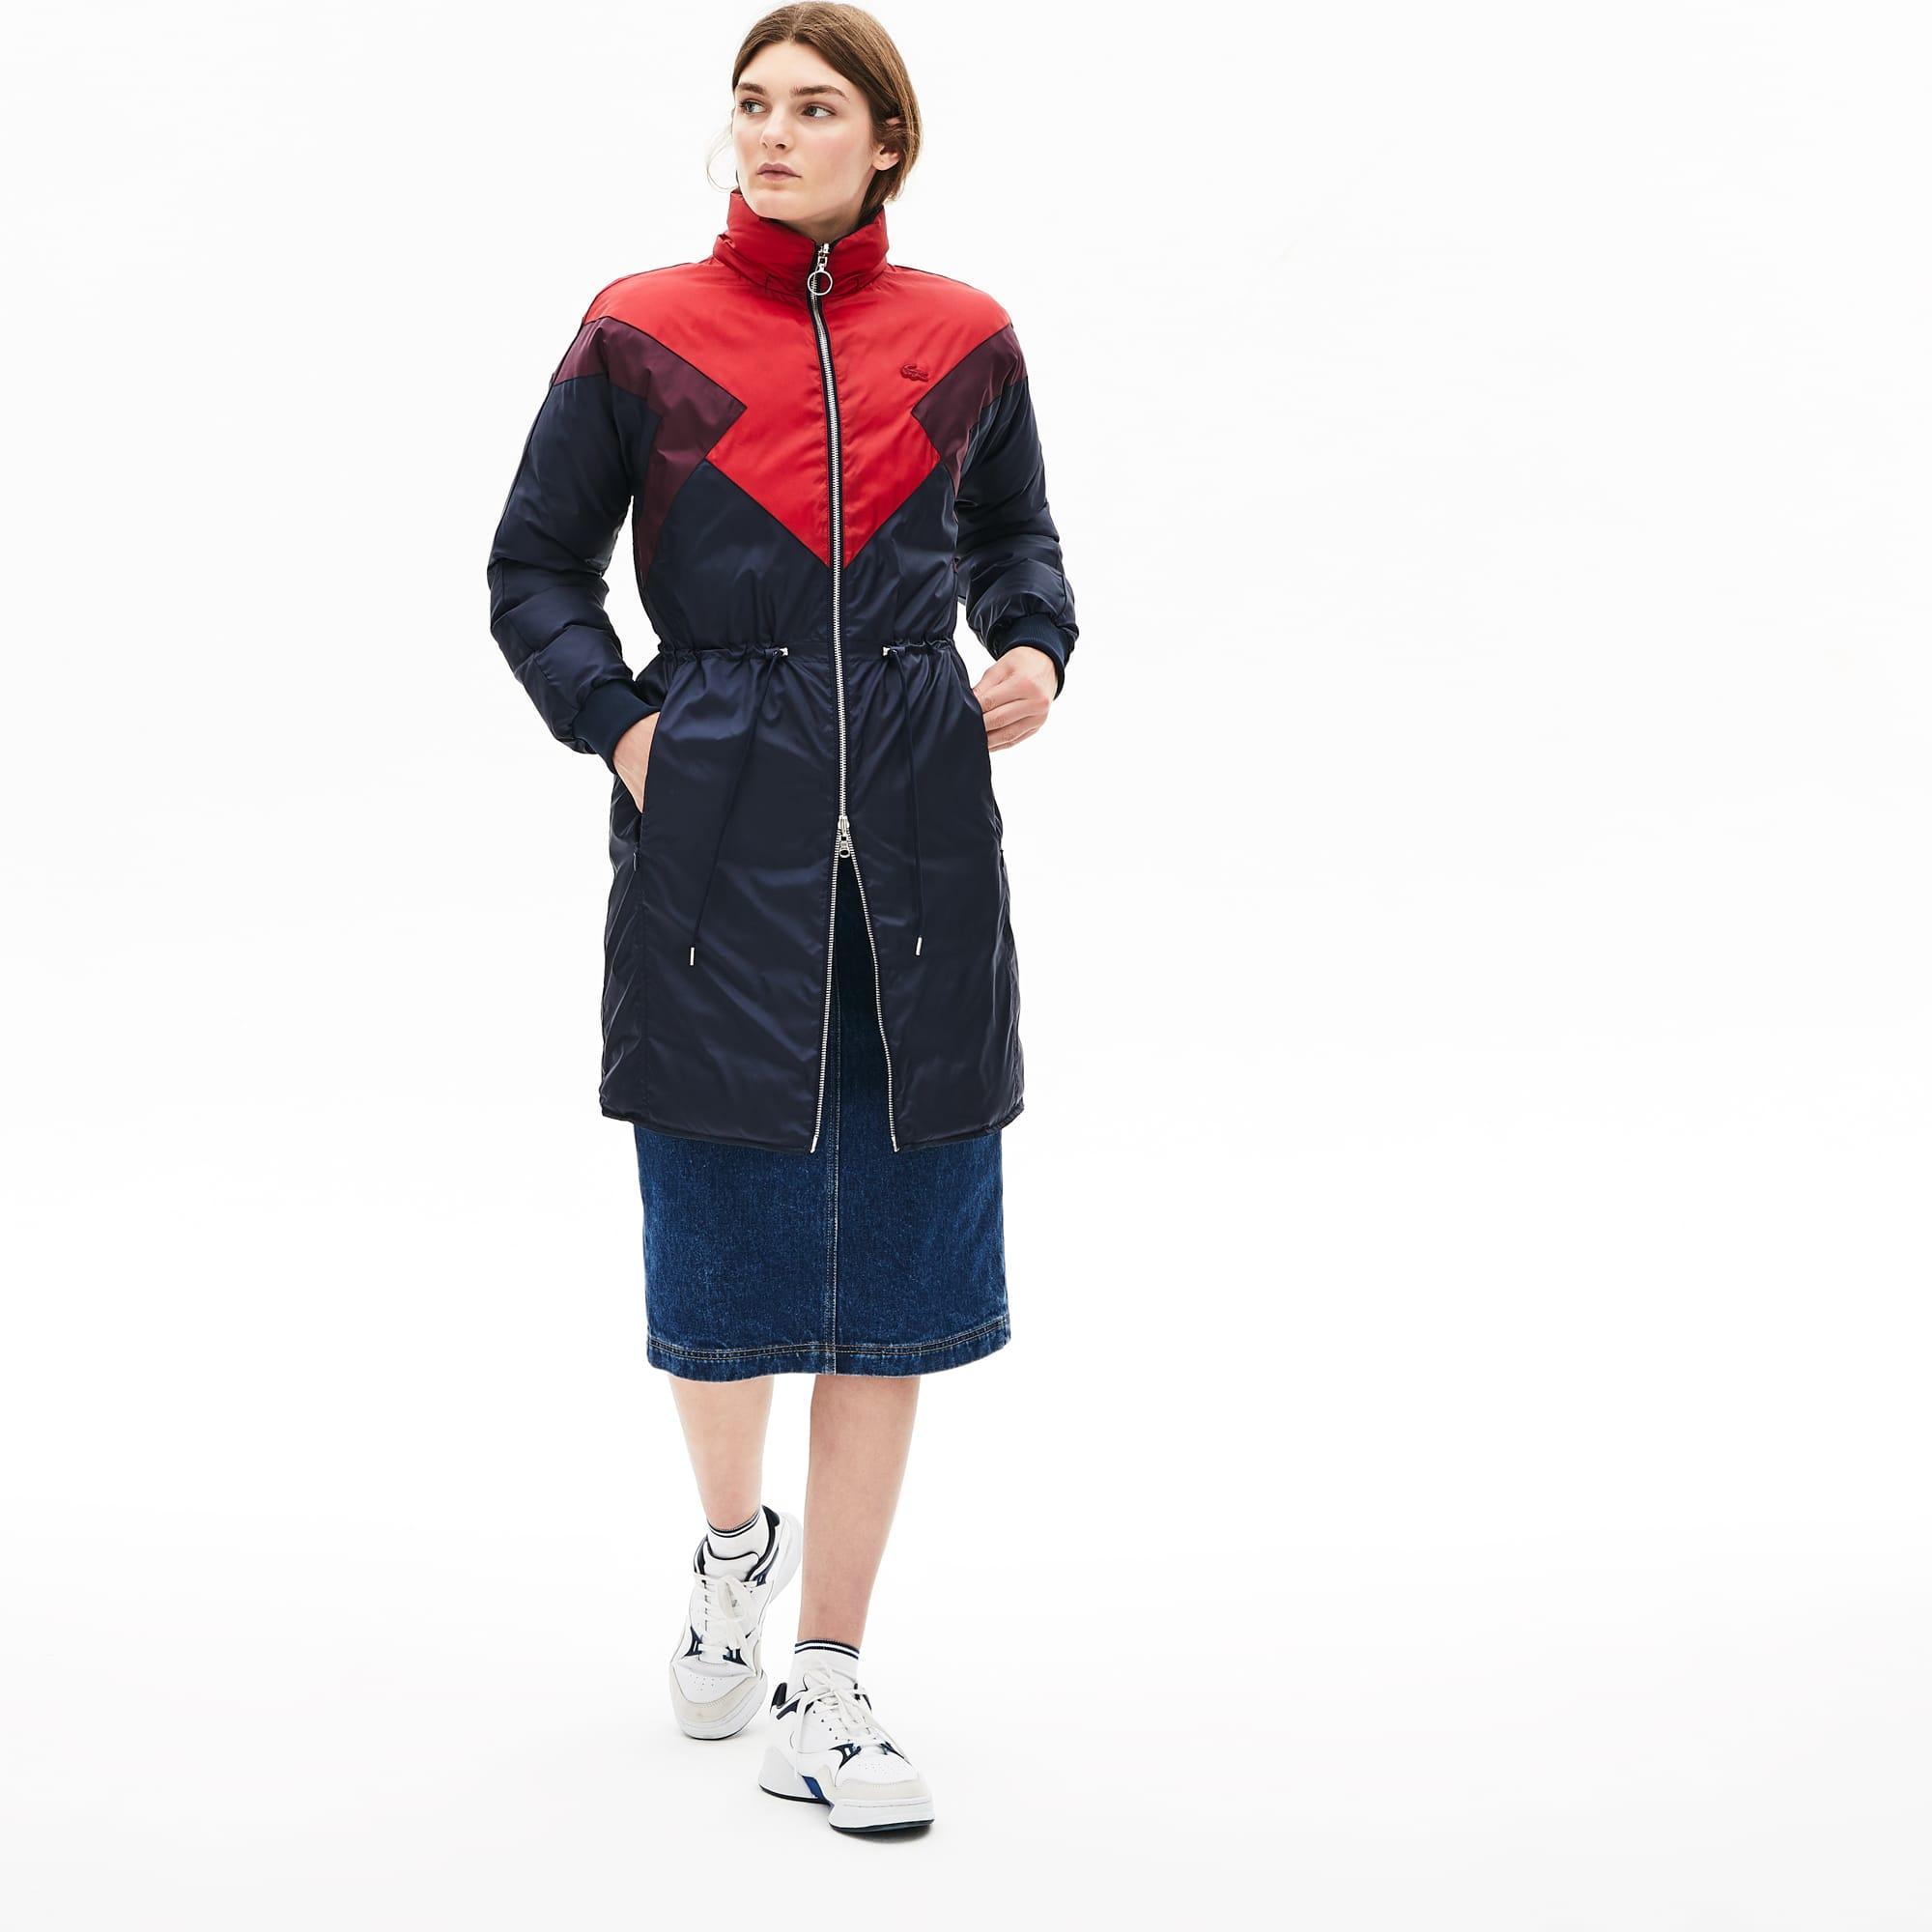 chaqueta acolchada reversible mujer